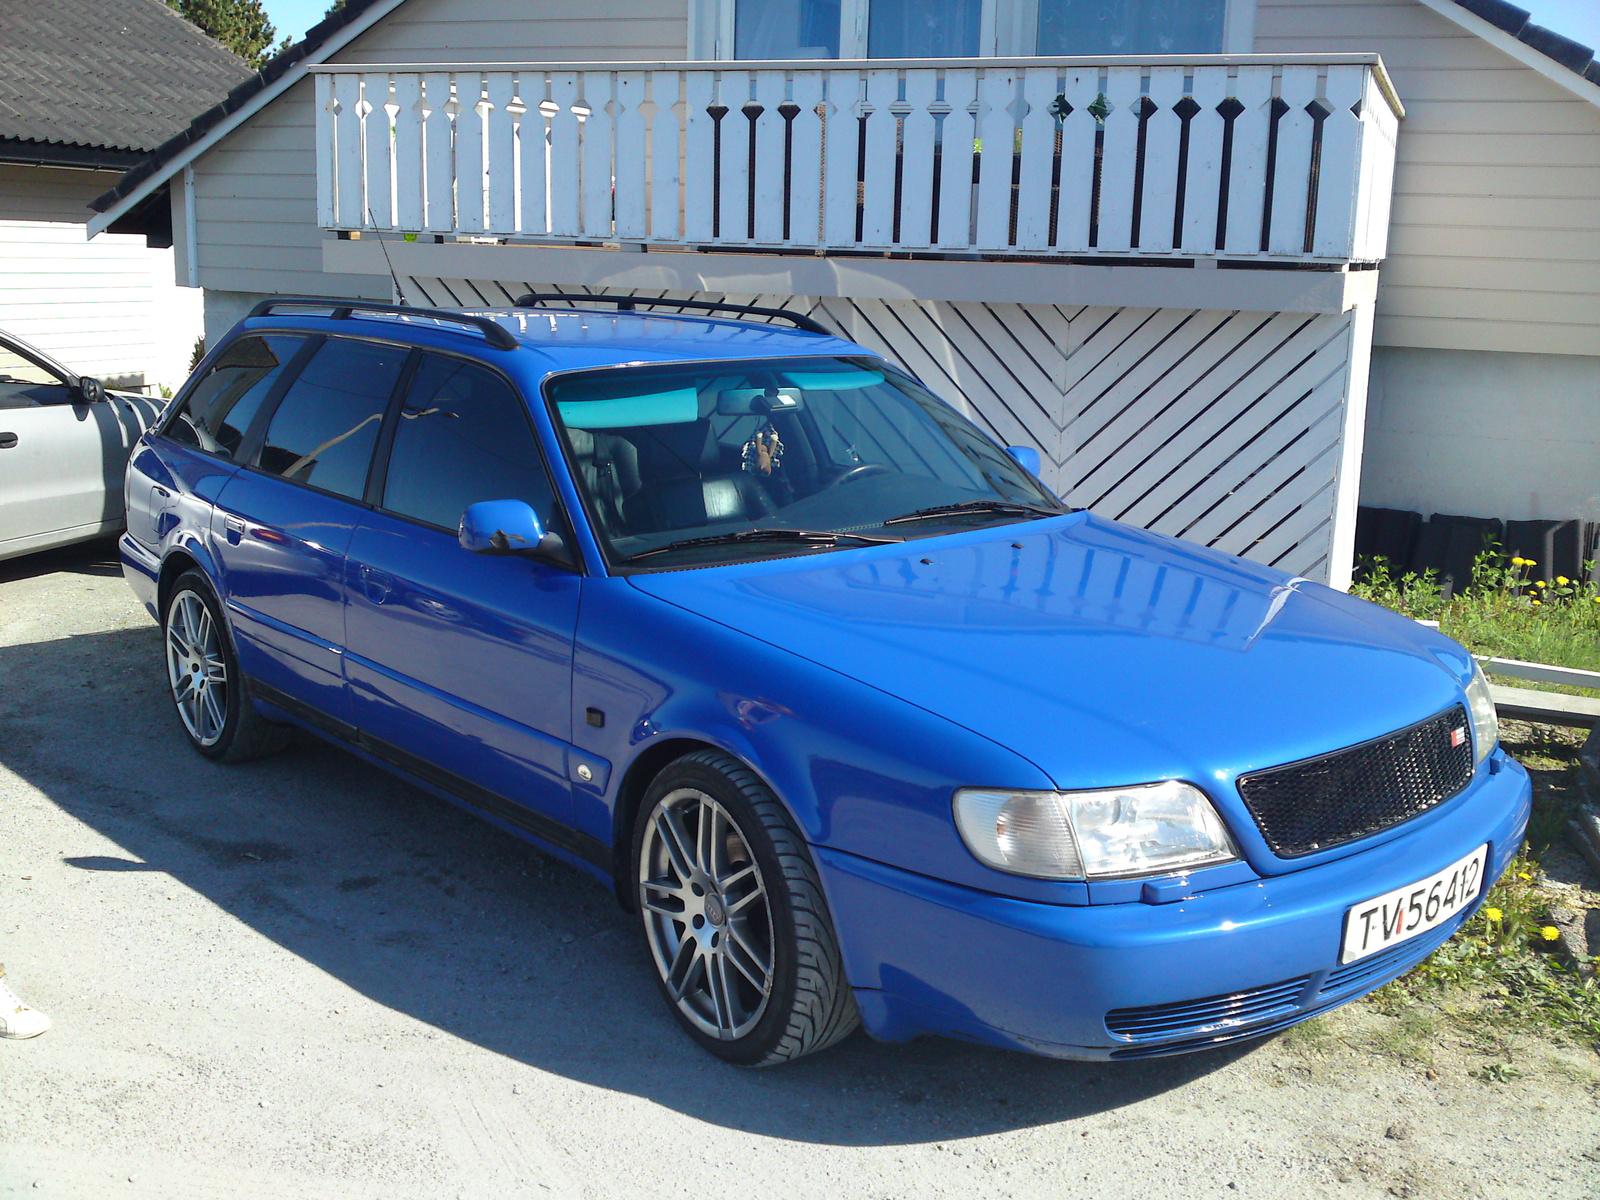 1995 Audi A6 Image 8